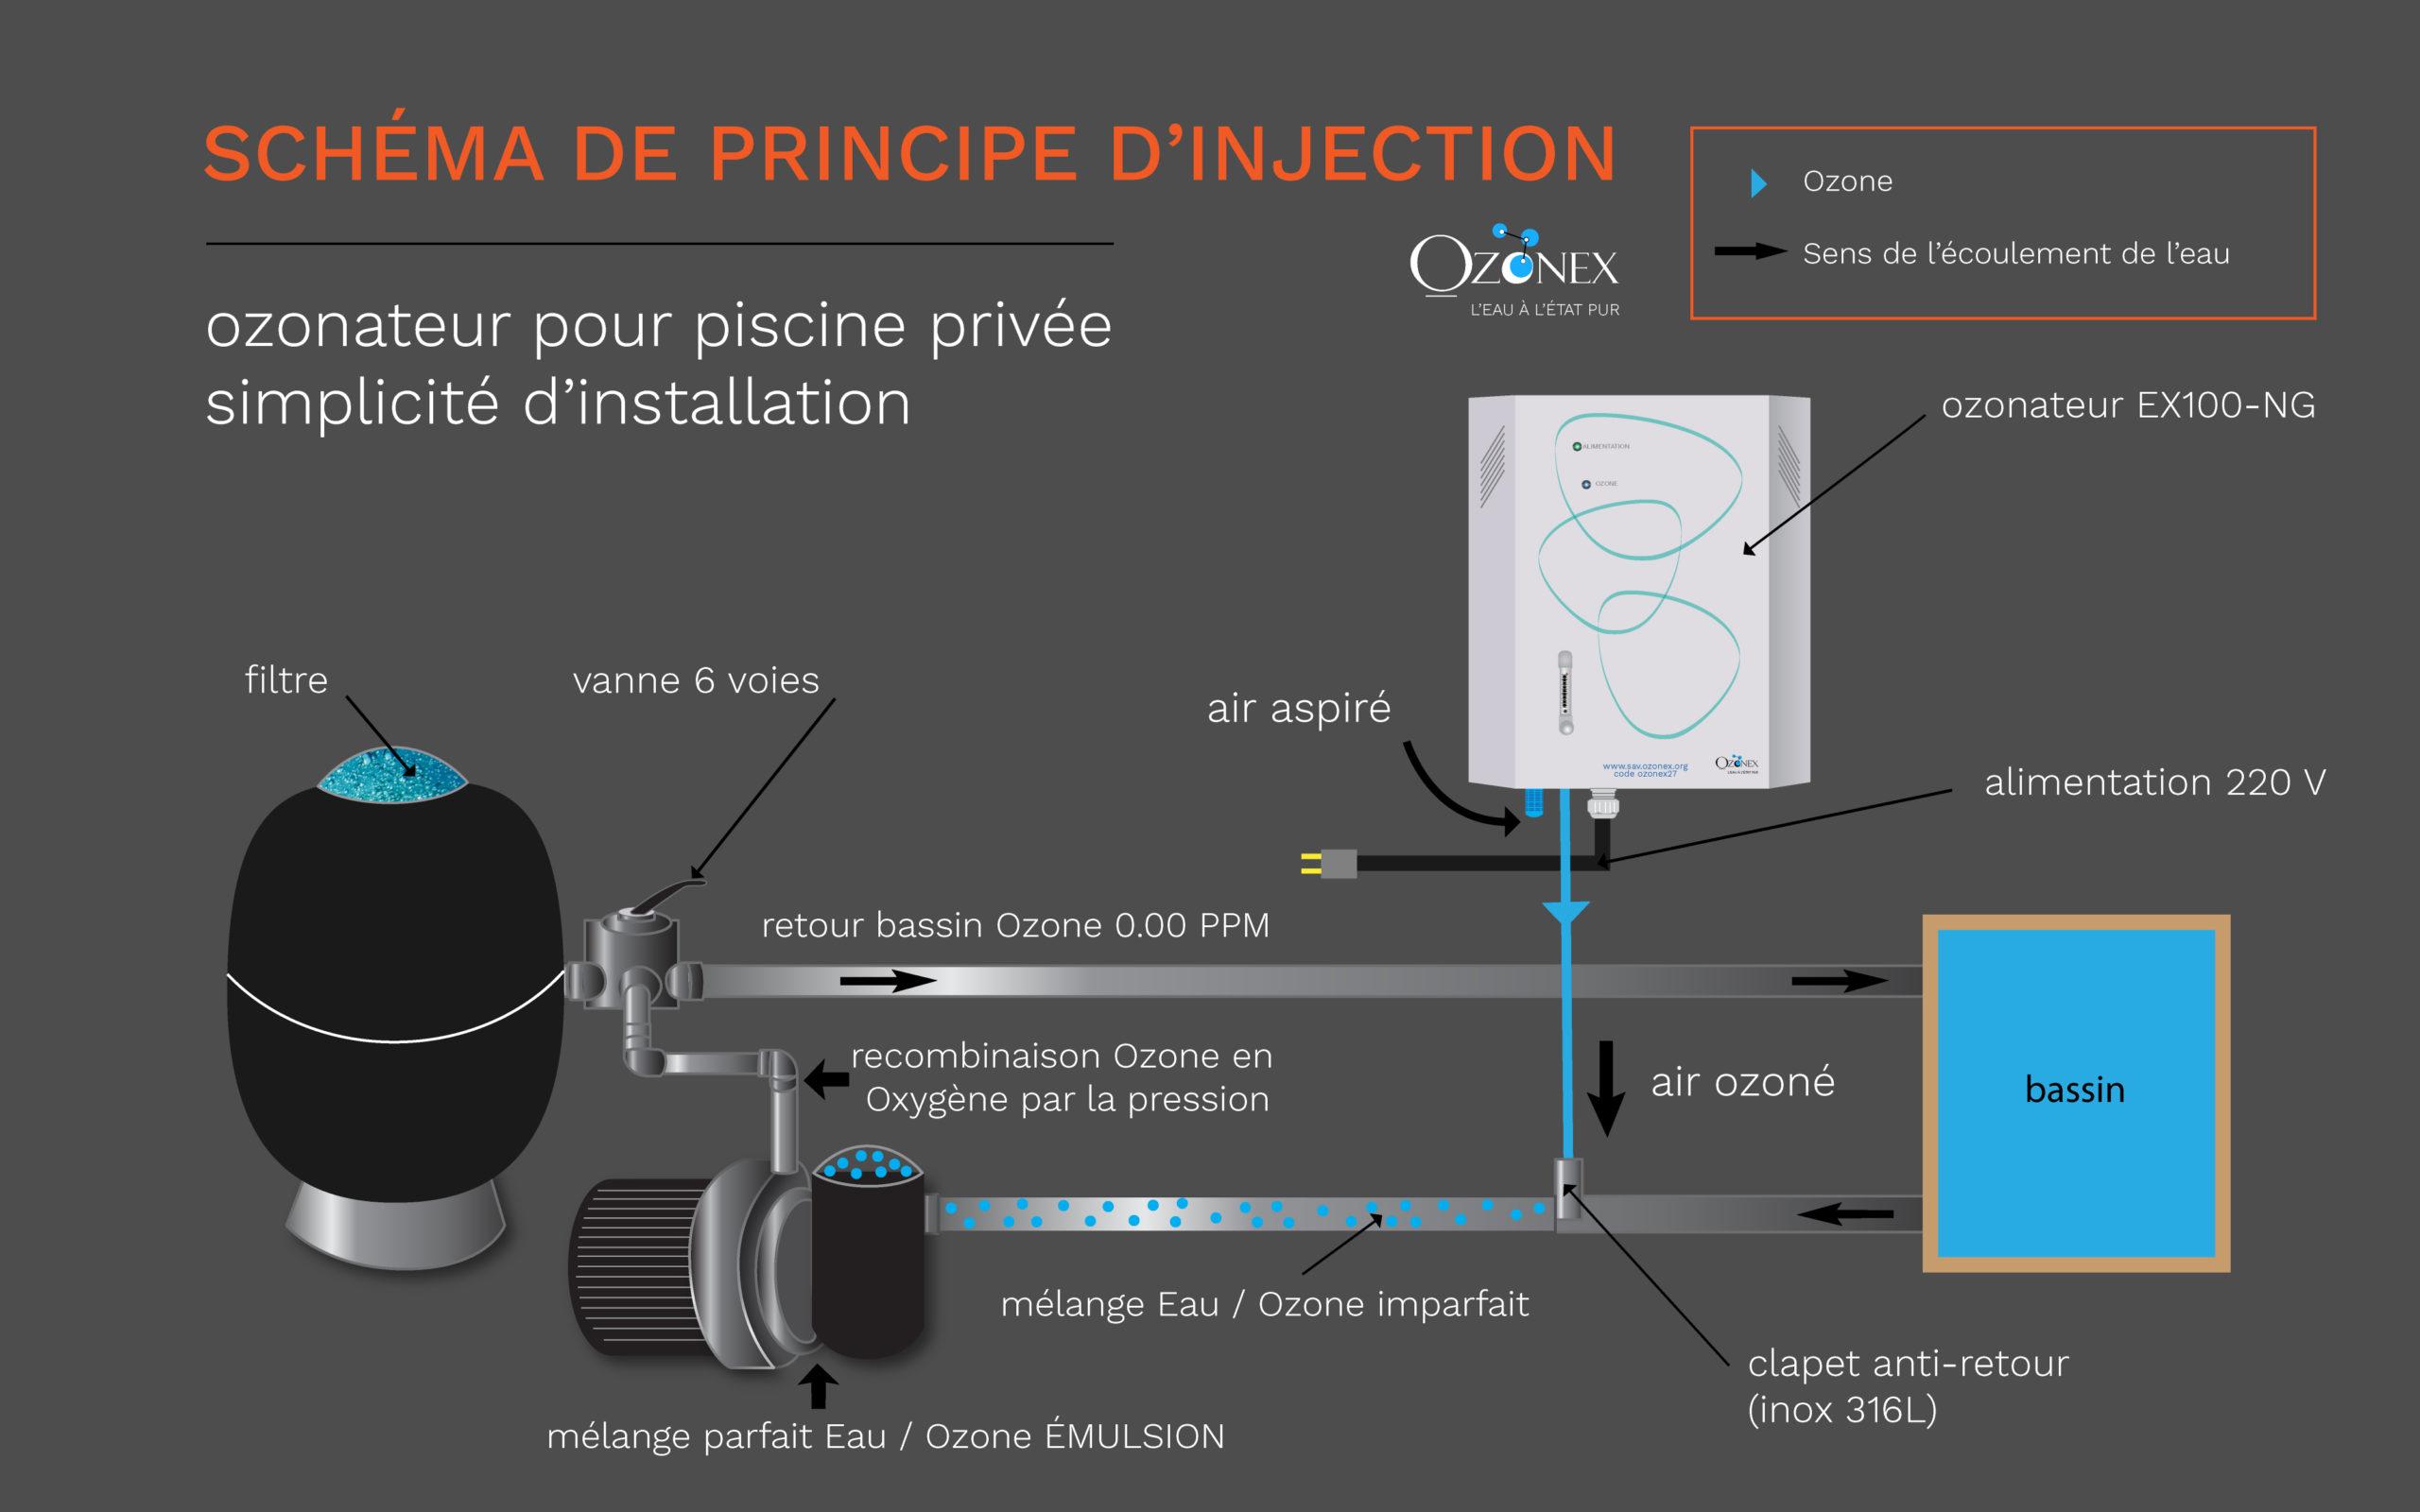 ozonex-plan-injection-ozone-pour-piscine-privee-traitement-eau-naturel-ozonex